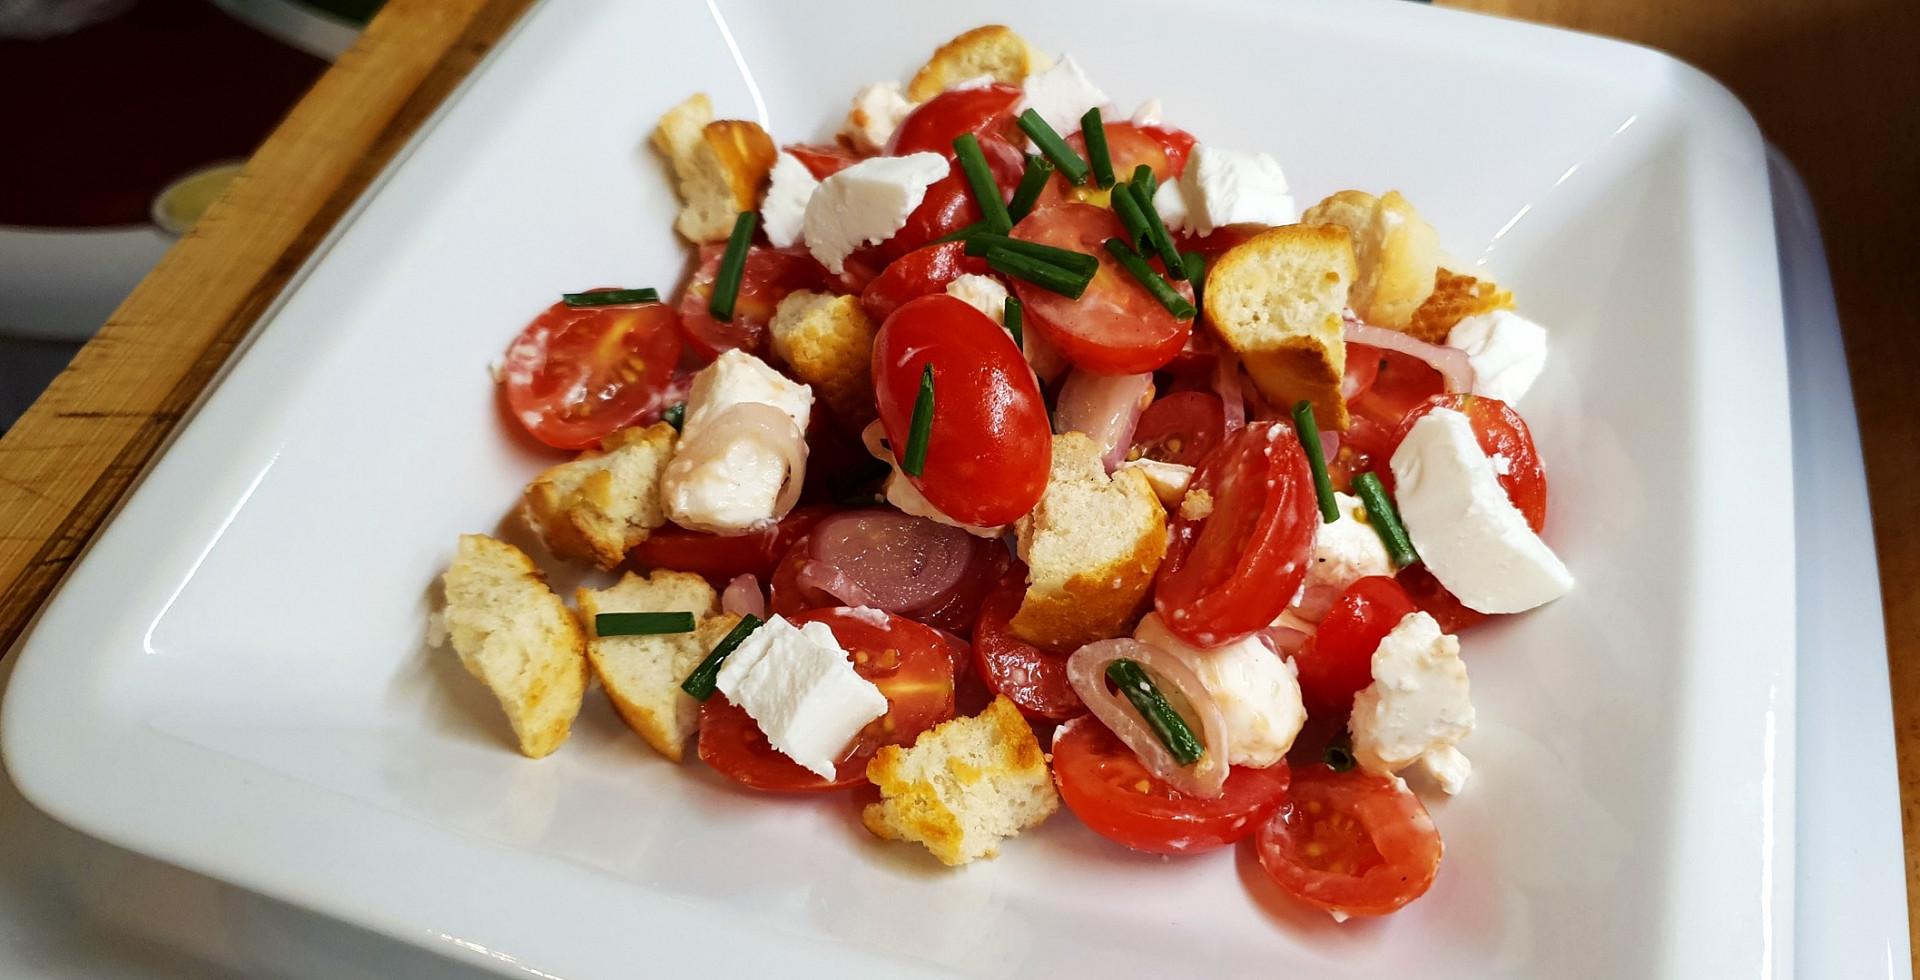 Rajčatový salát s kozím sýrem a křupavými krutony